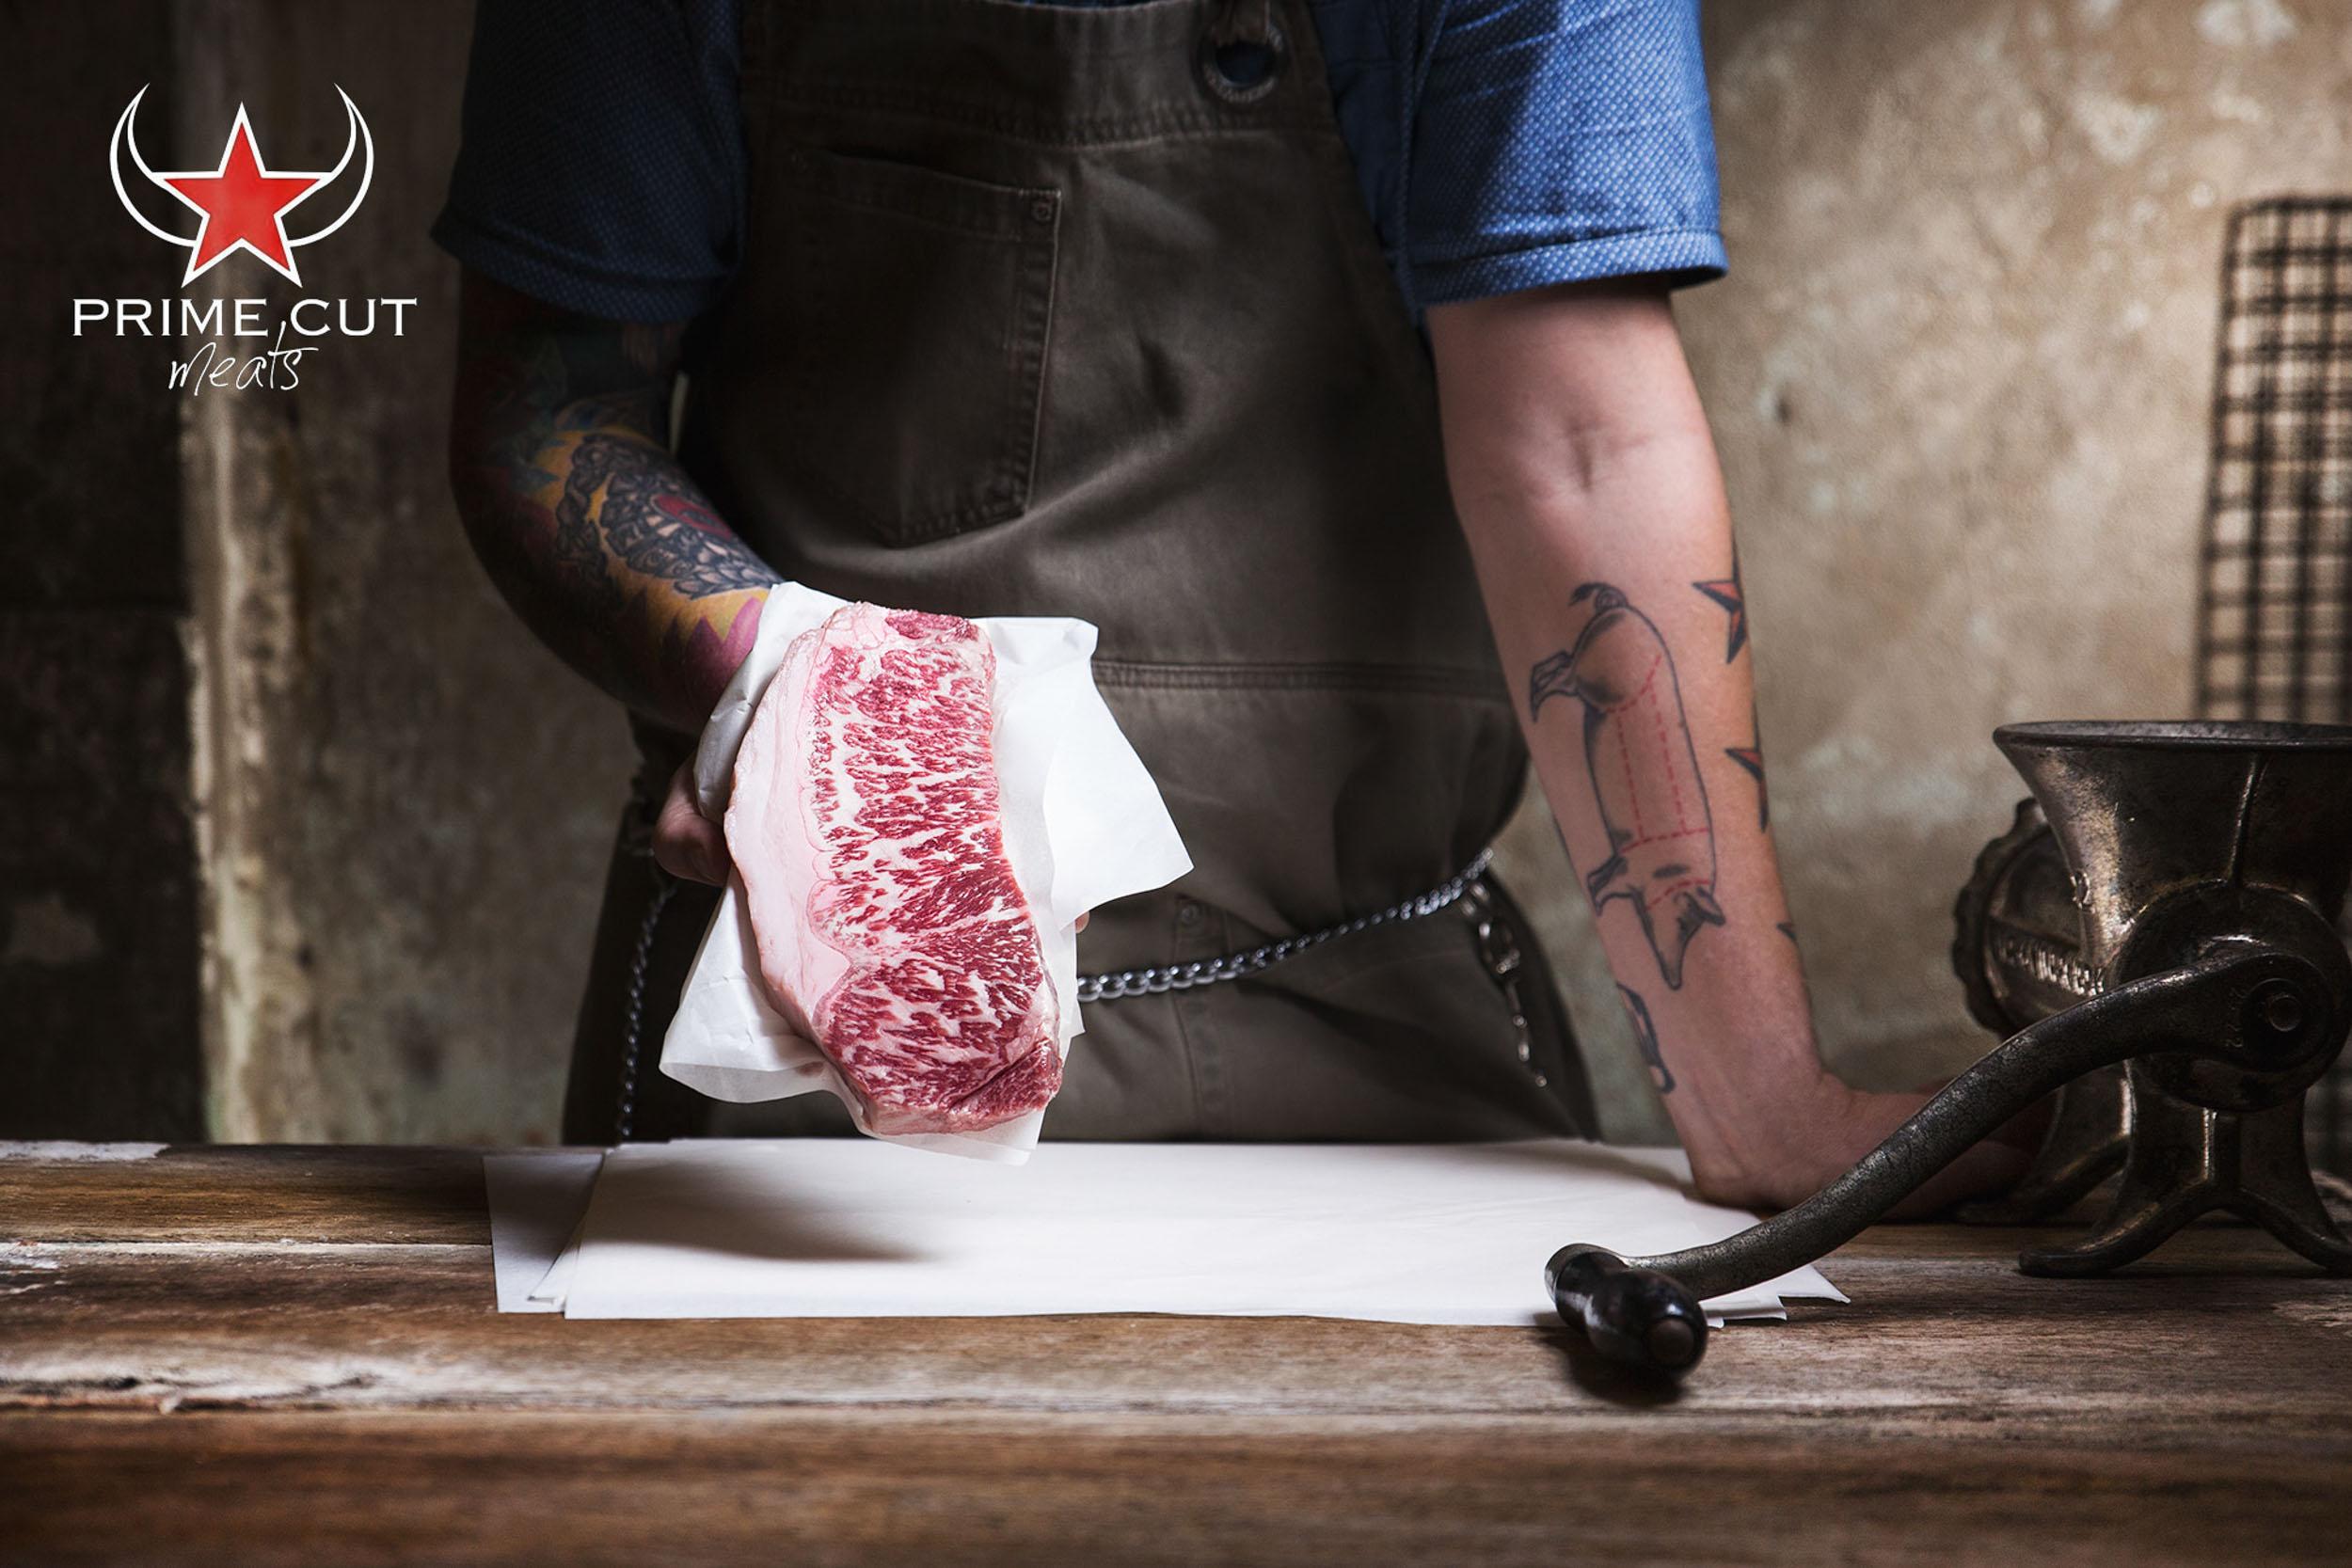 steak in hand.JPG